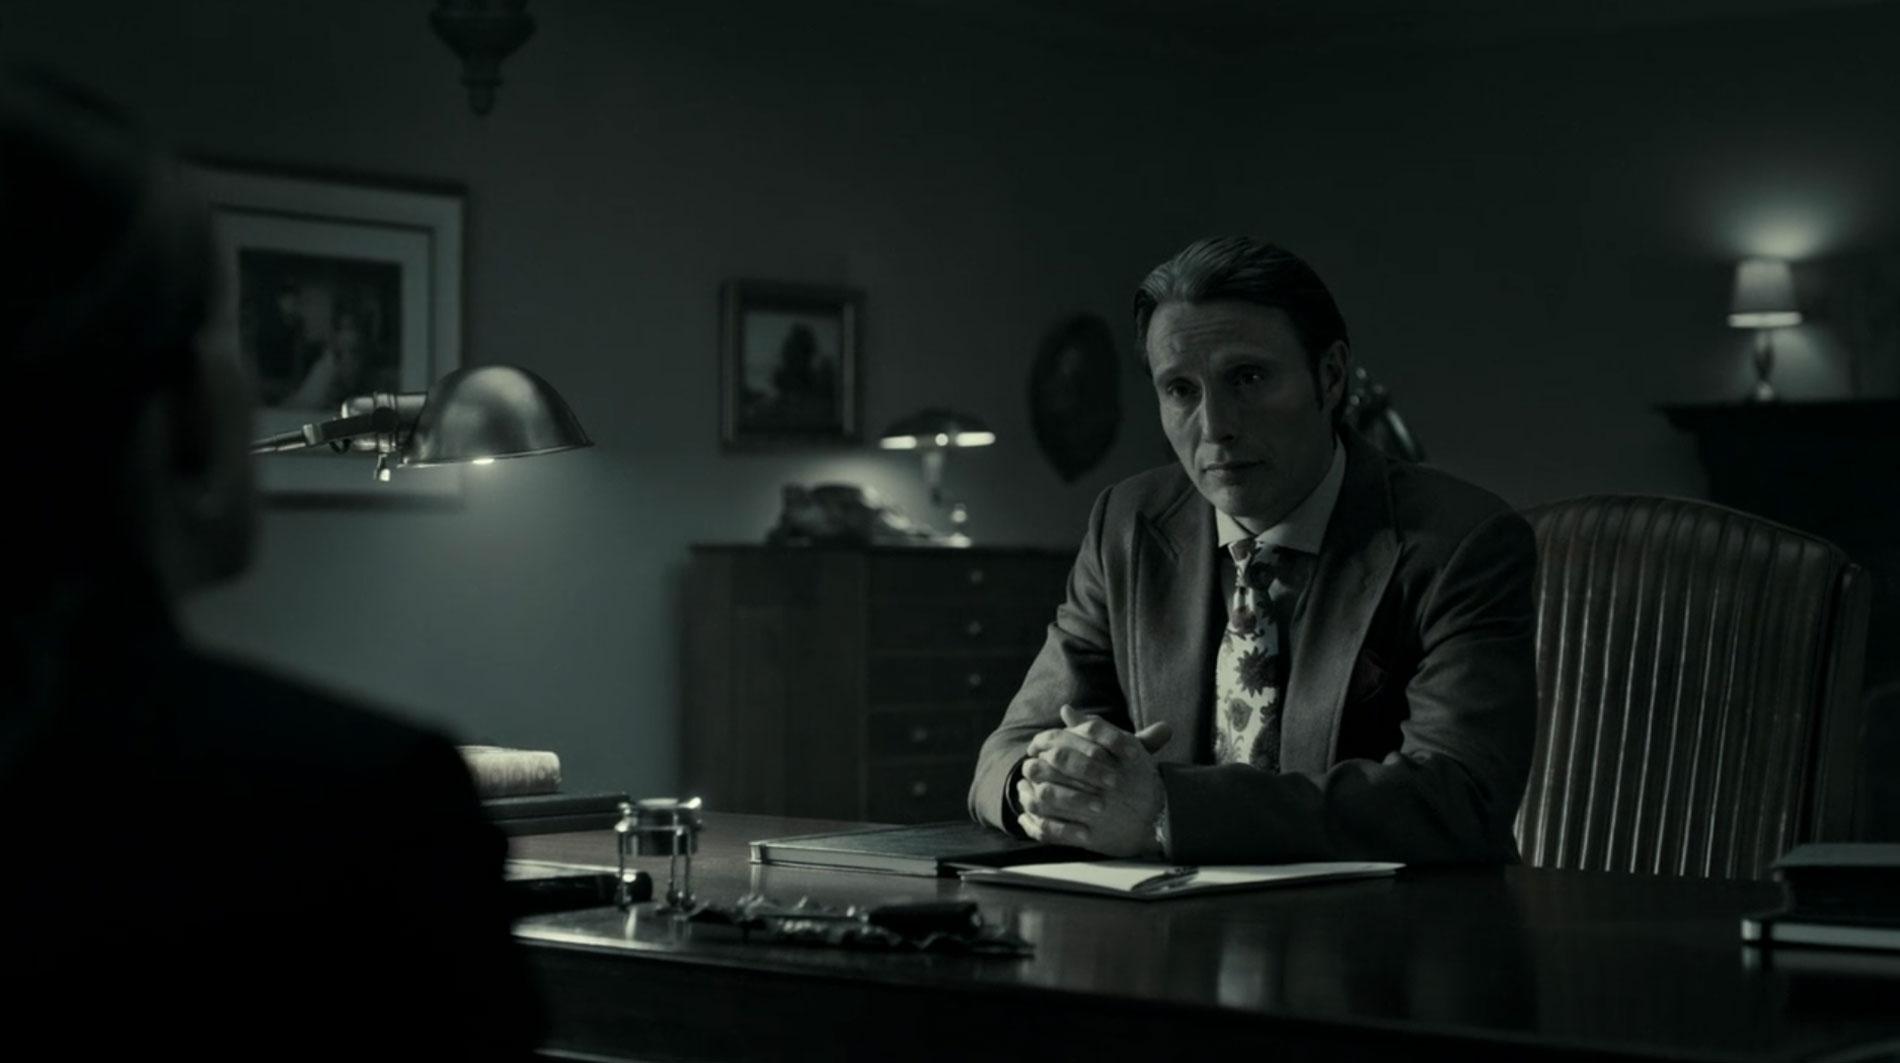 Paisley Silk Tie on Hannibal in Flashback